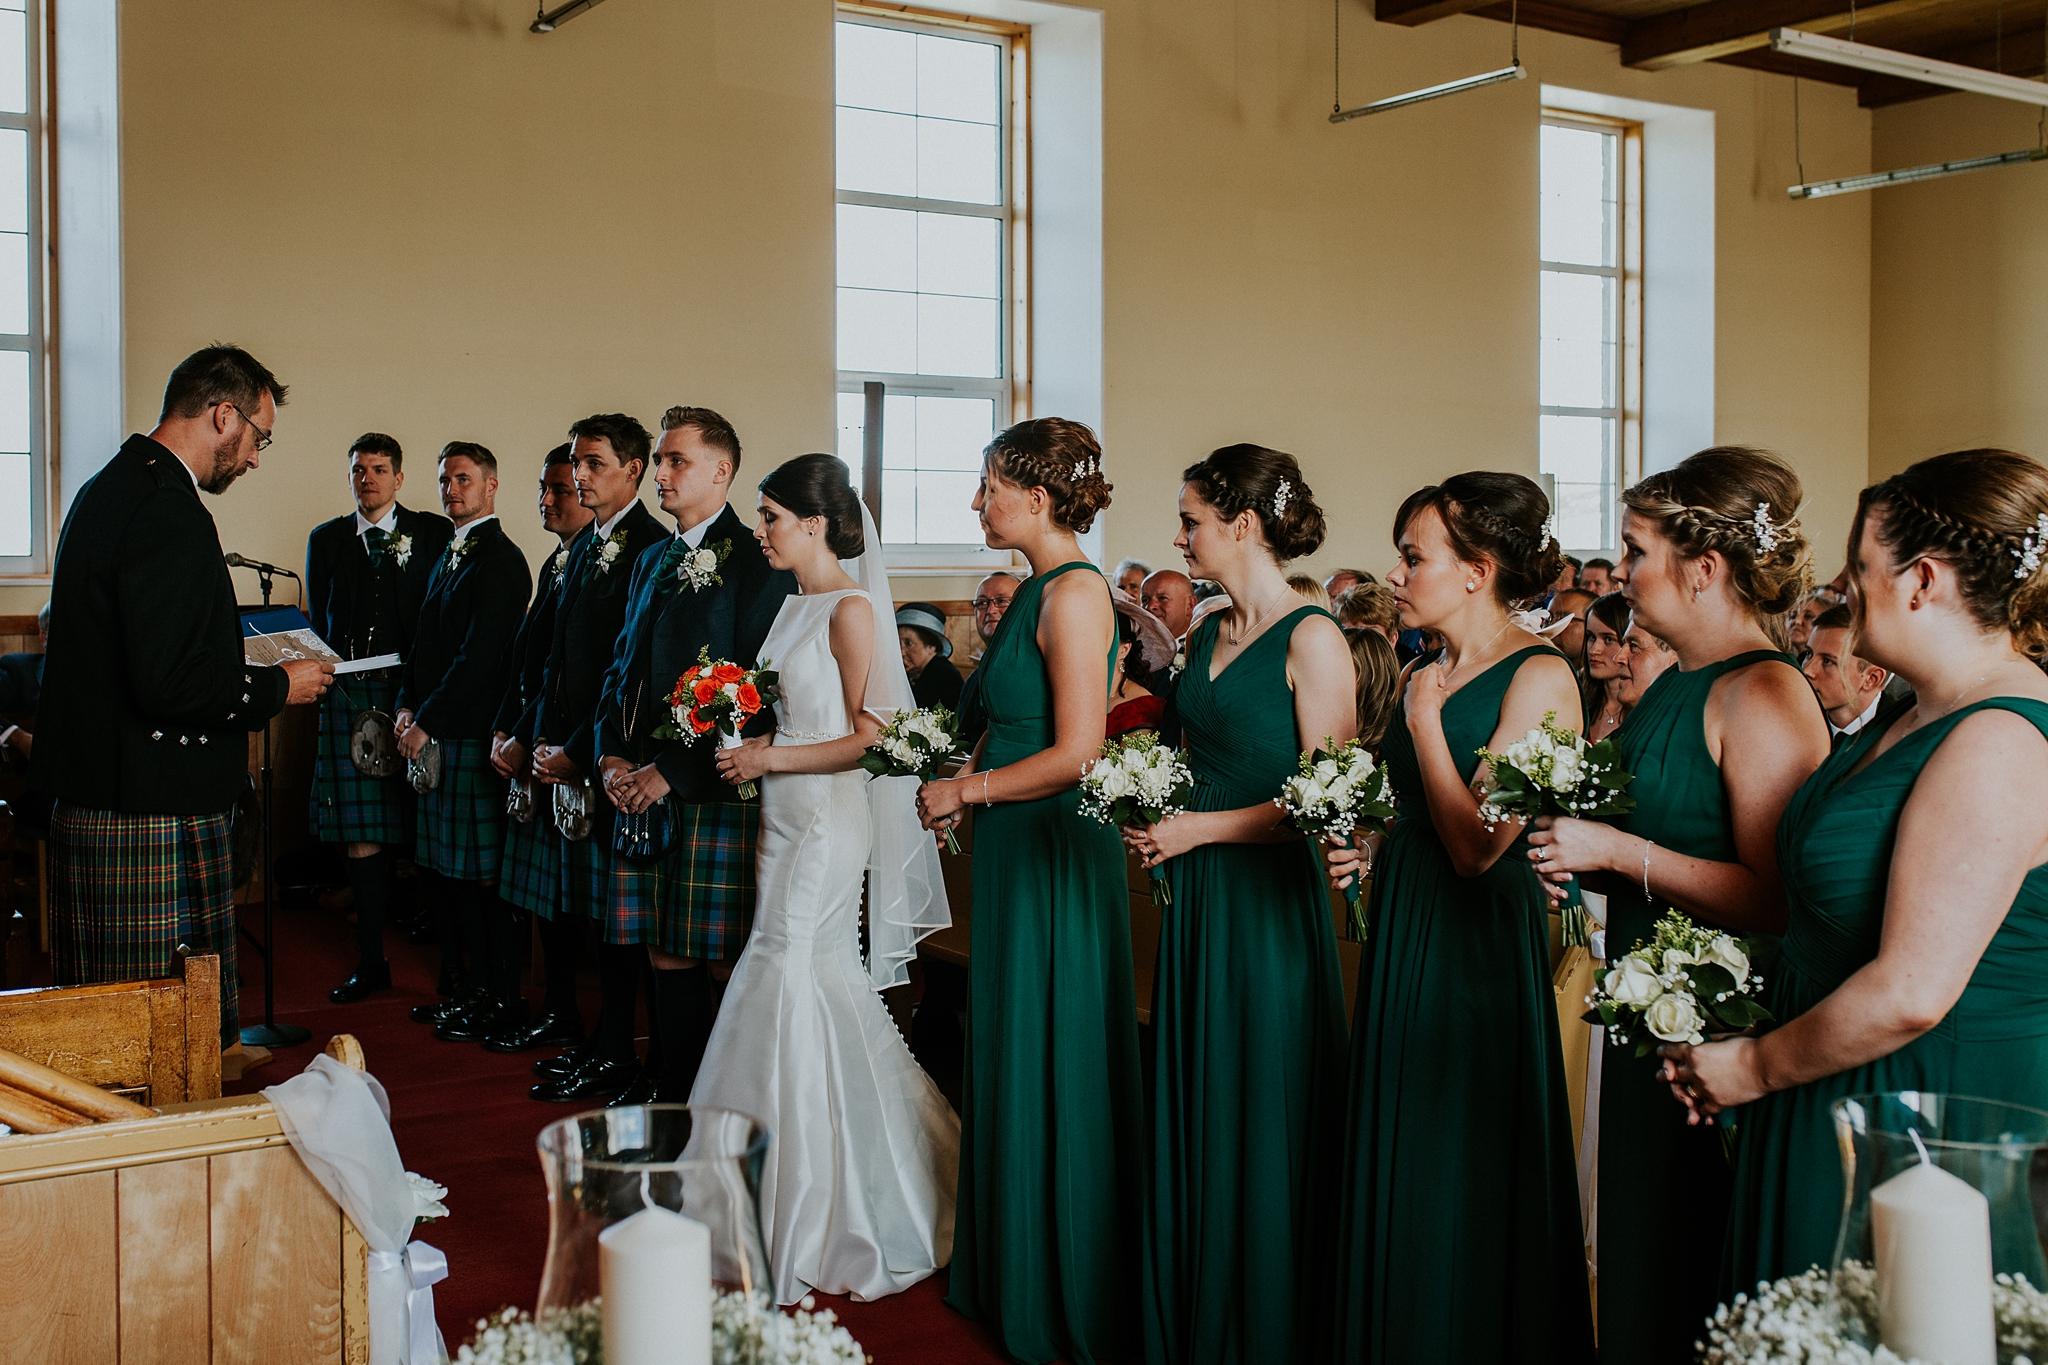 Linda&Shockie_northuist_wedding_photographer-17.JPG